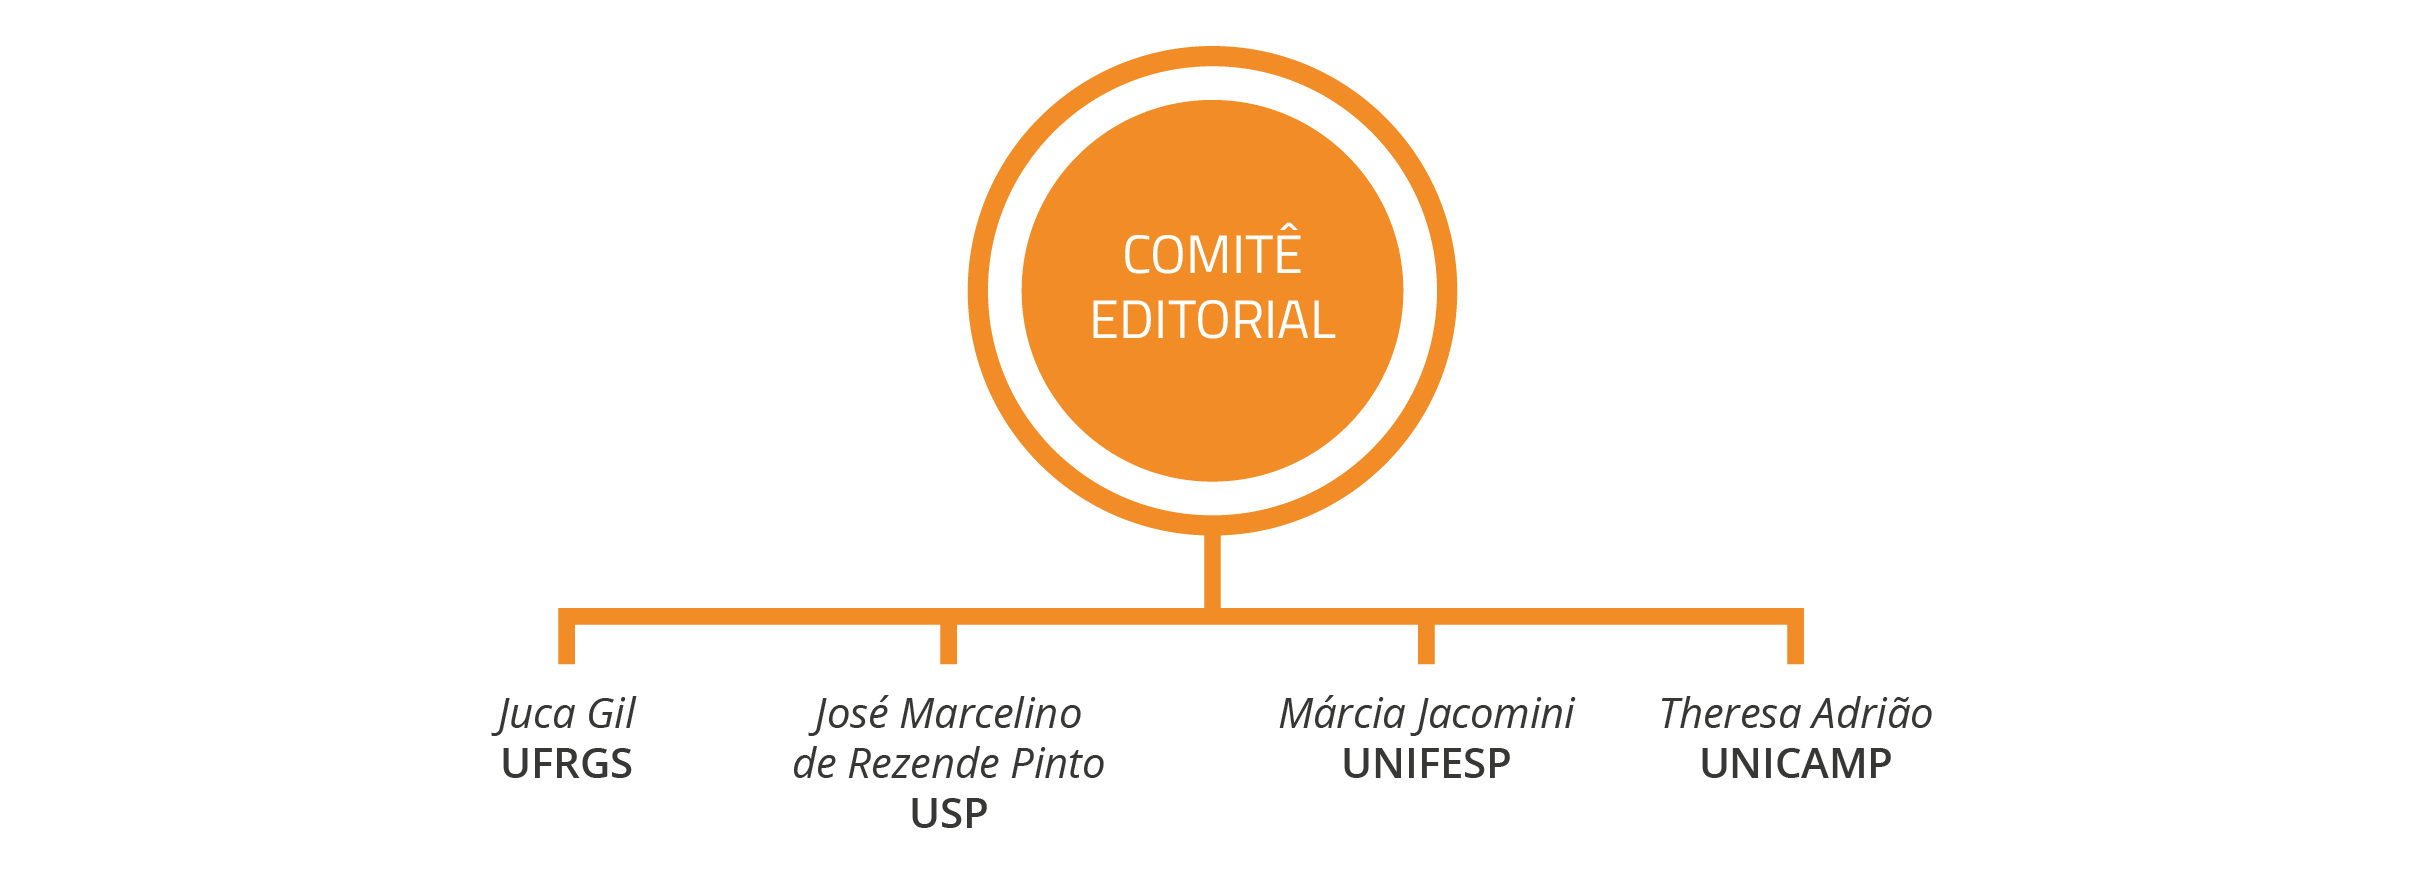 comiteeditorial-02